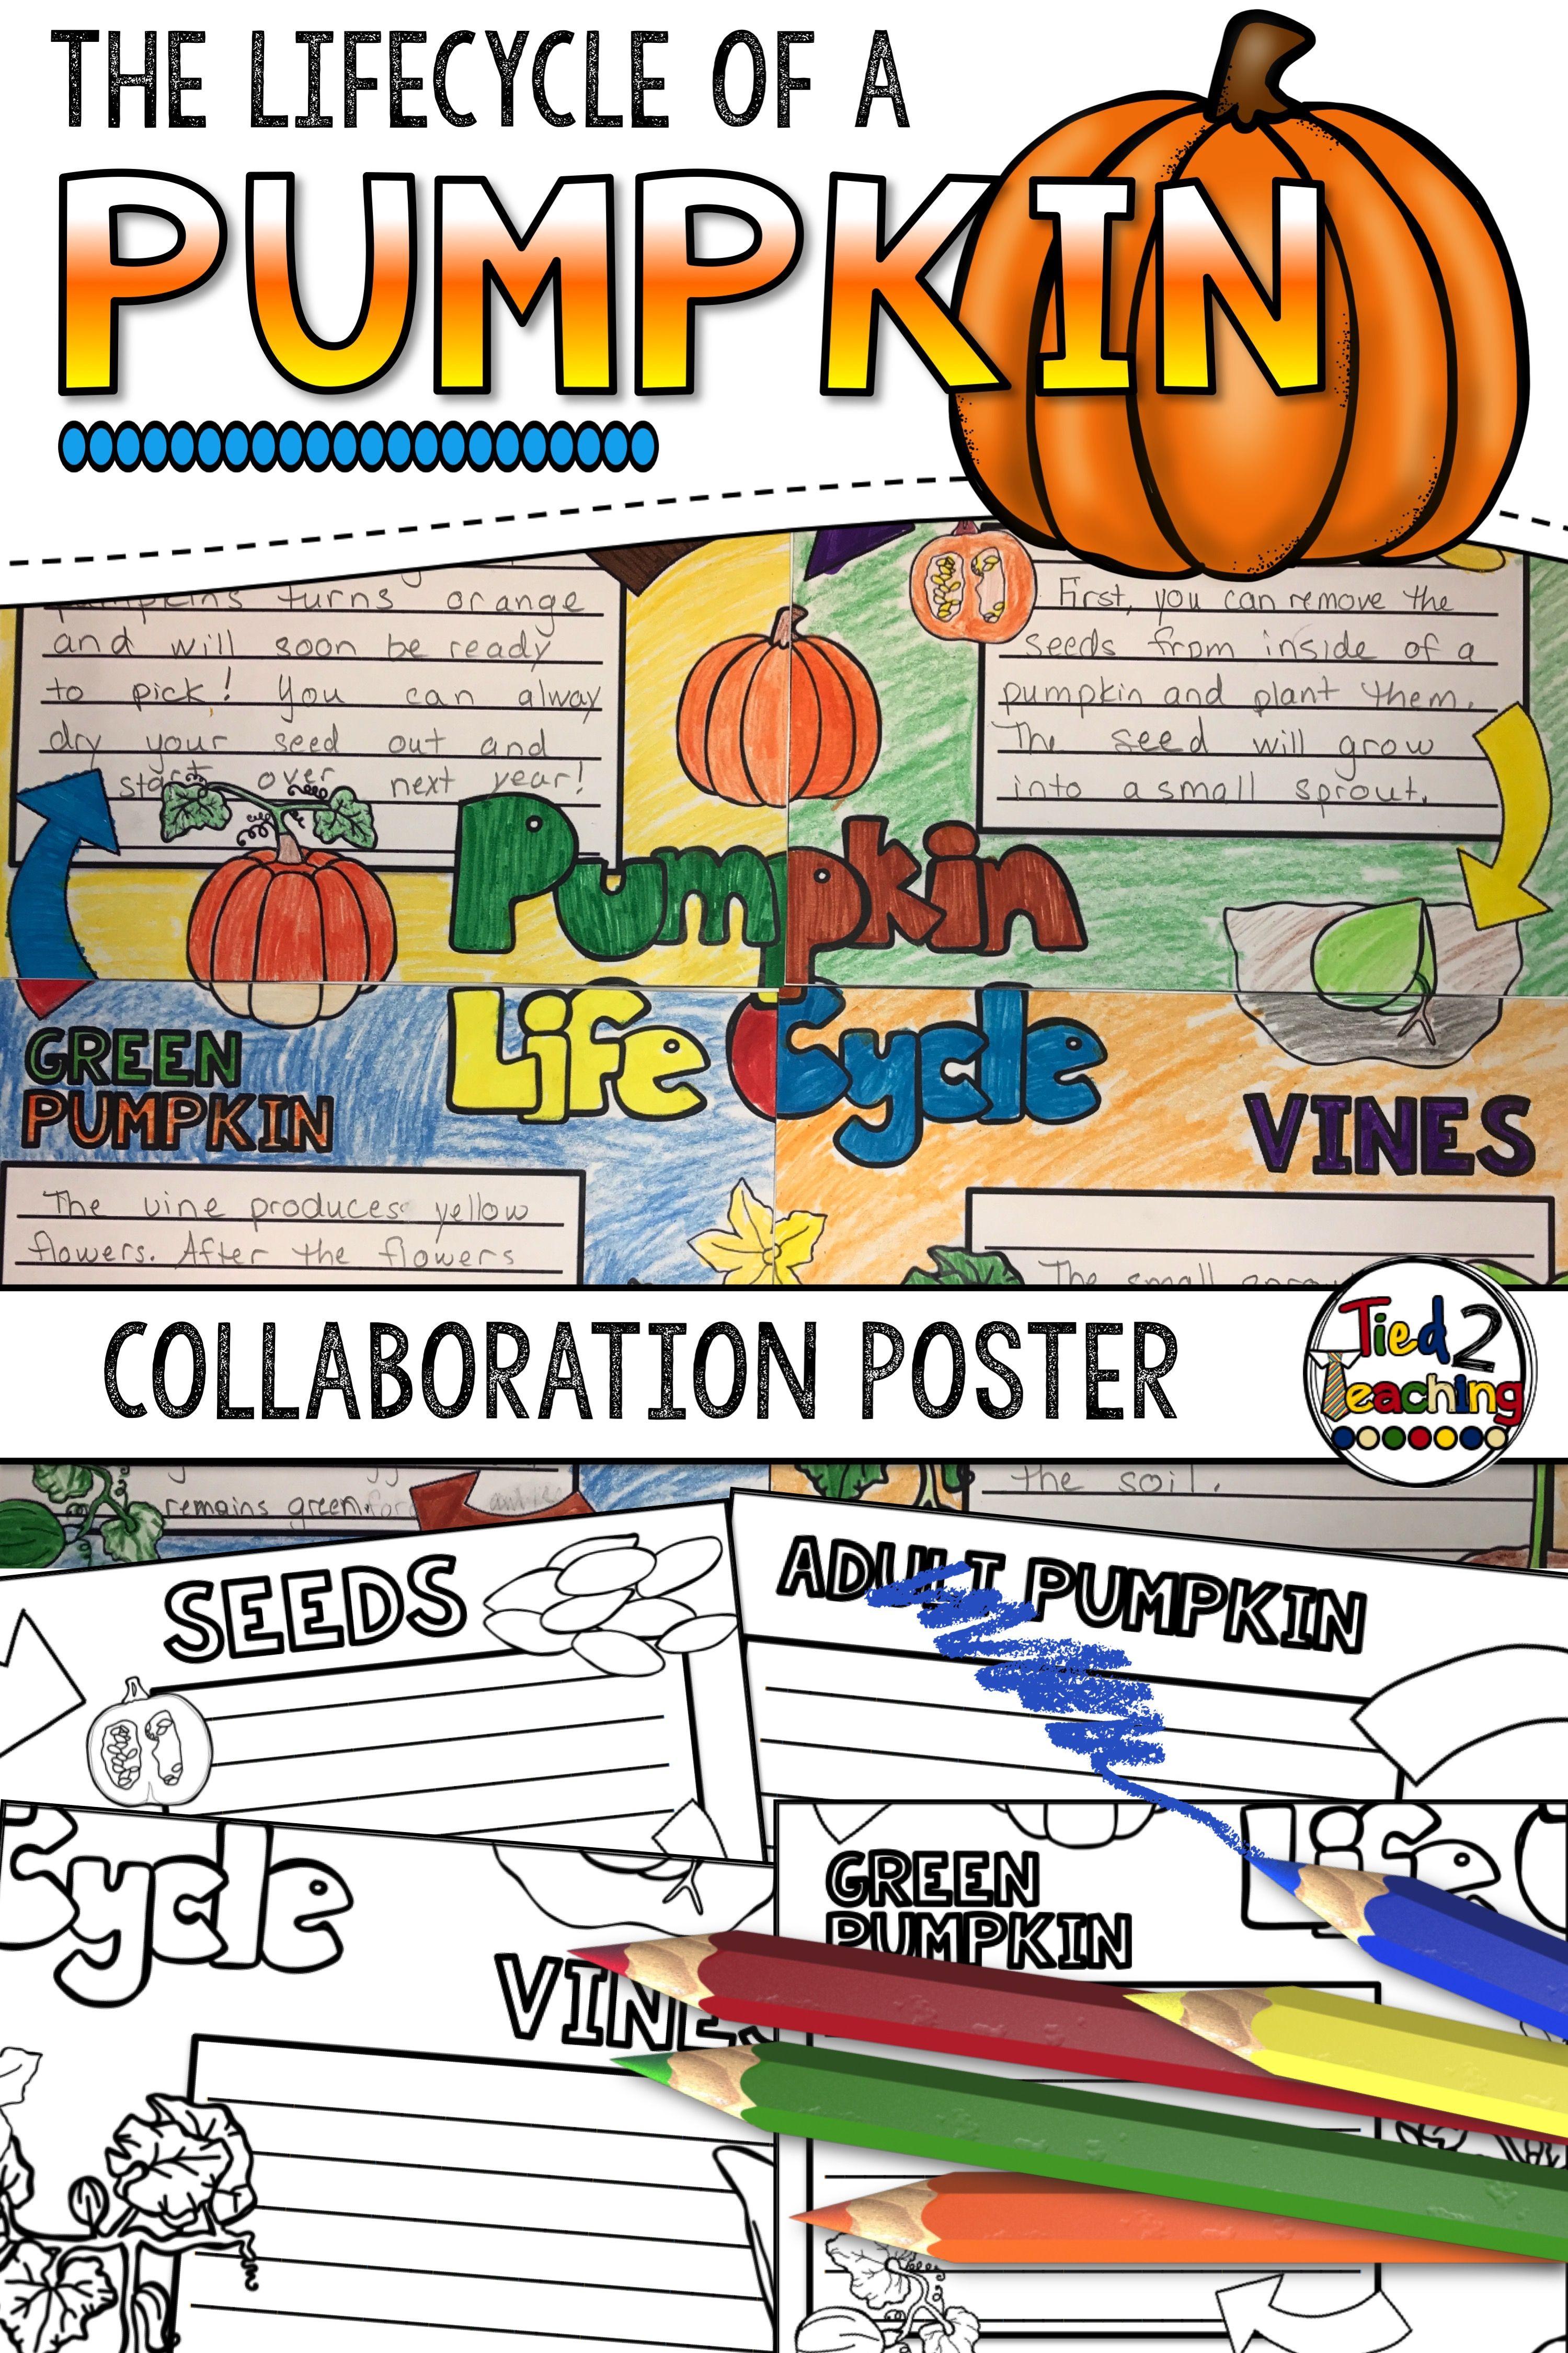 Pumpkin Life Cycle Activity Collaborative Poster